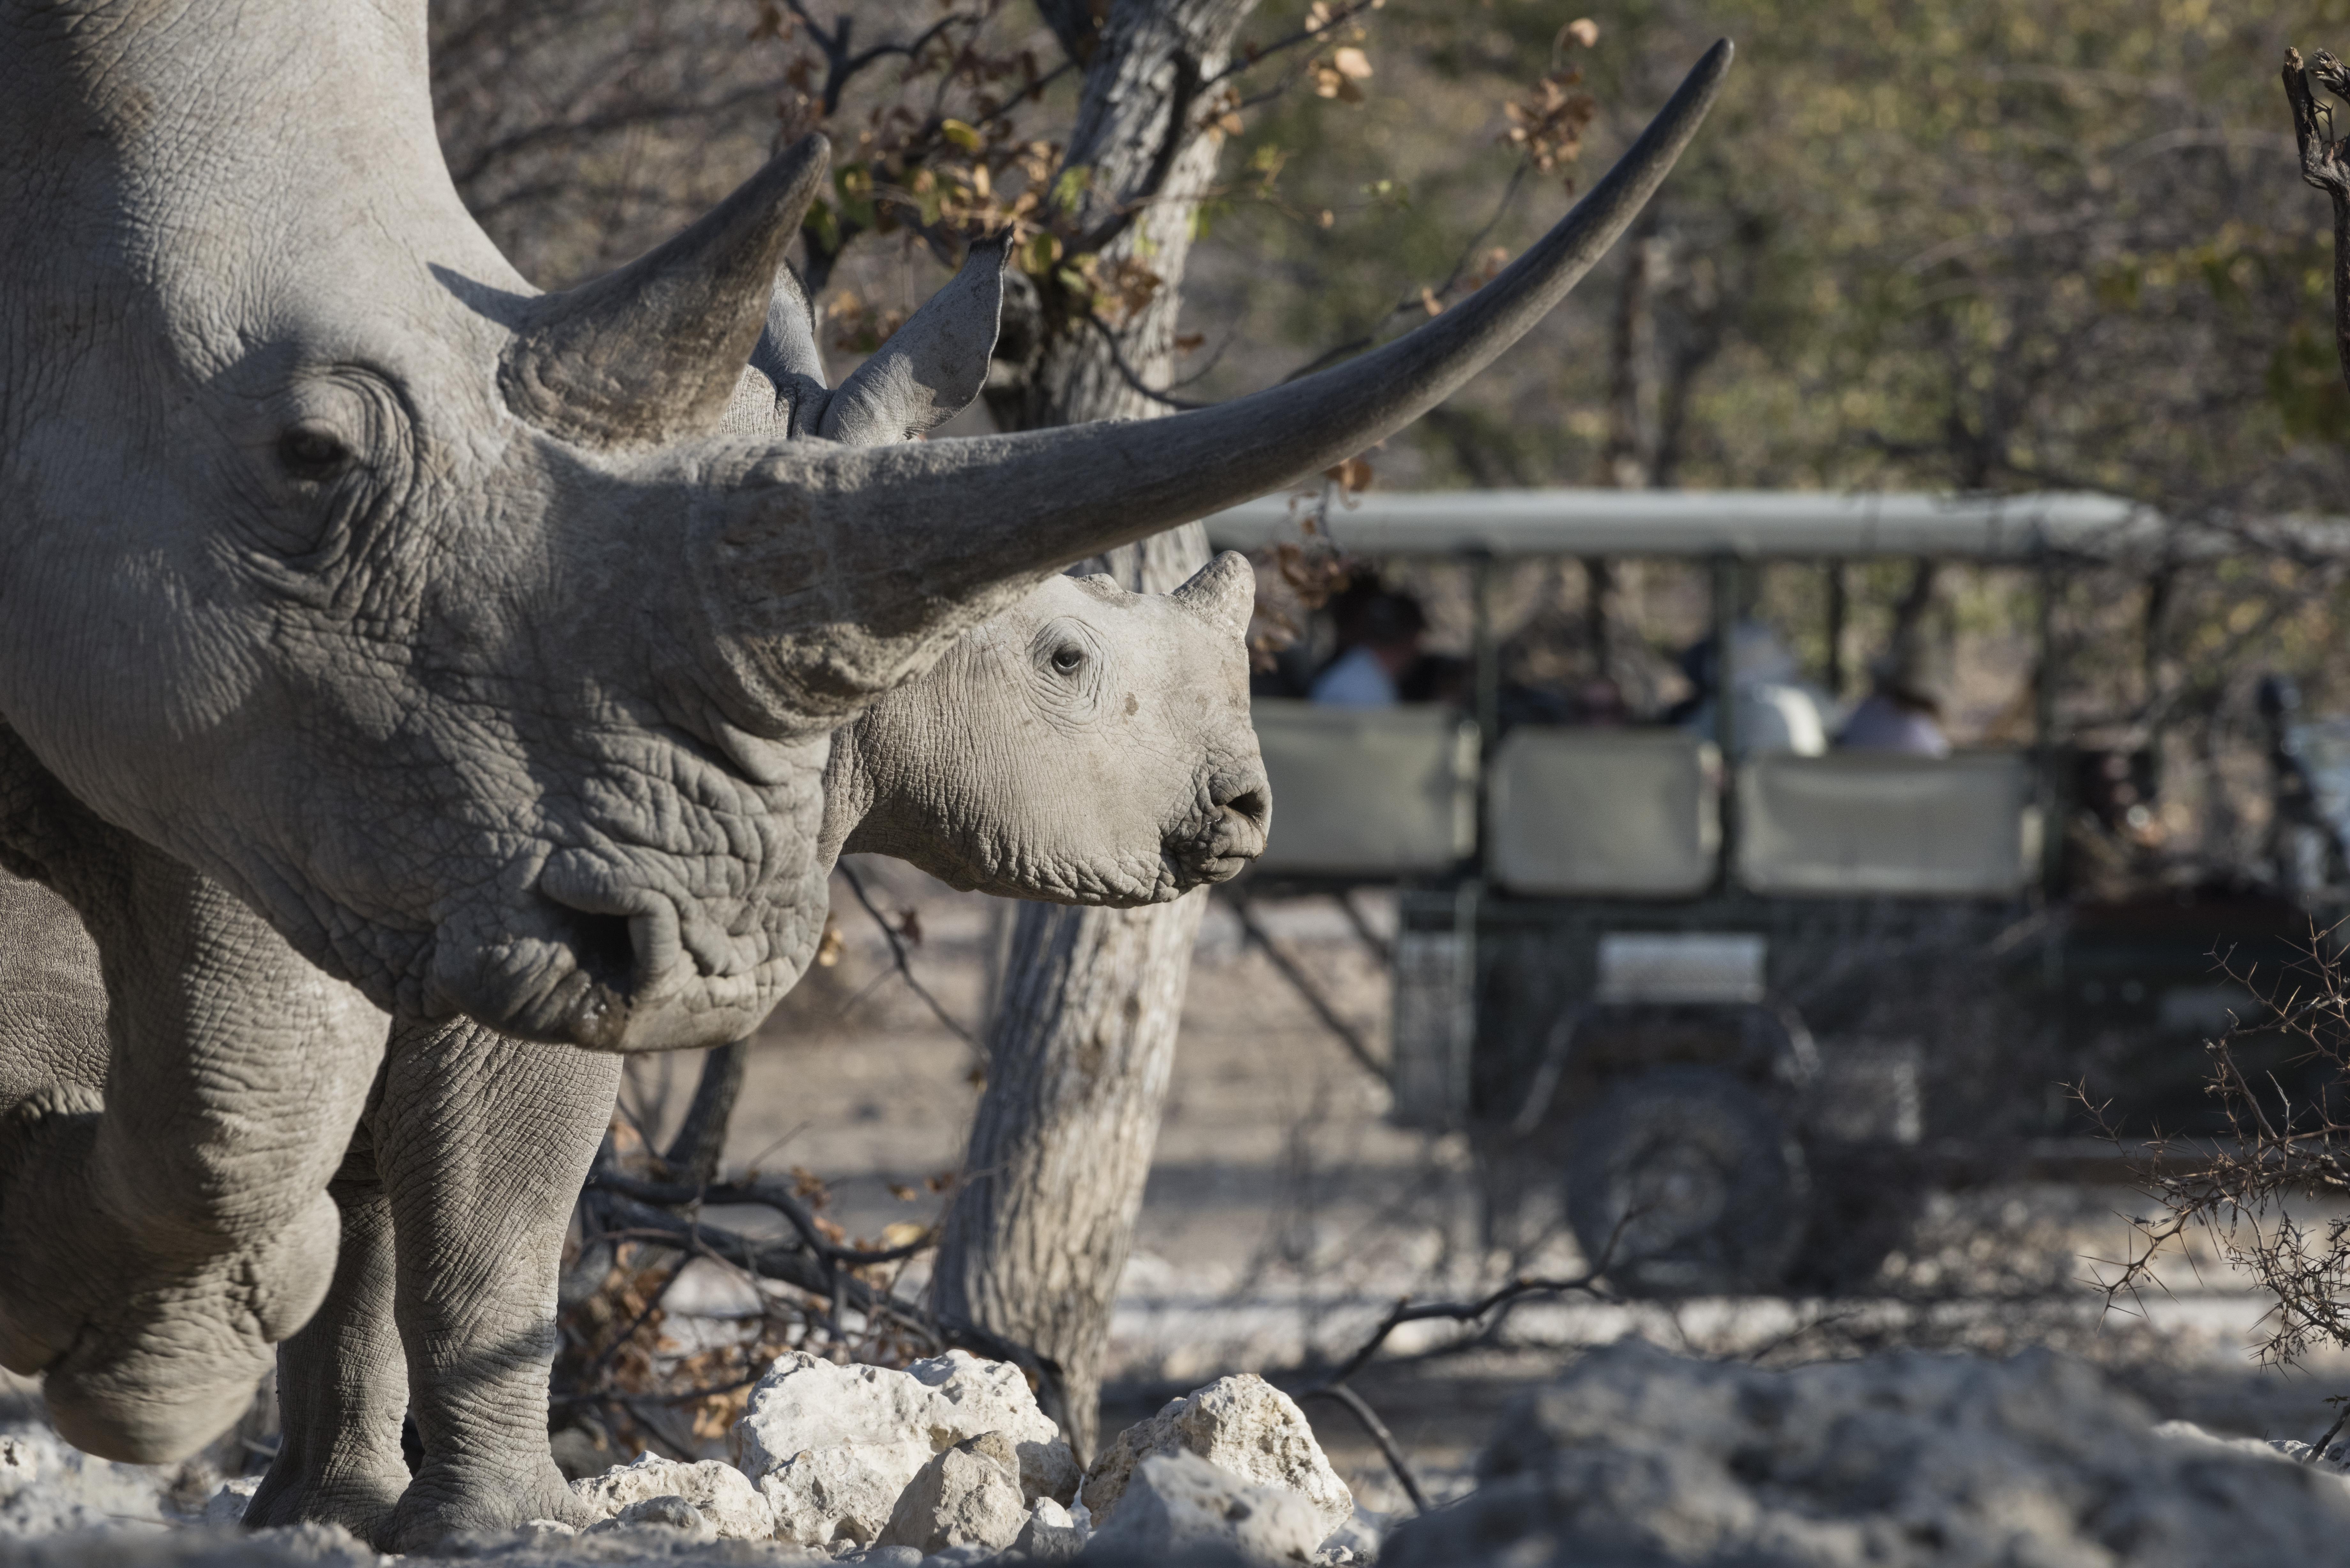 Rhino in the Reserve